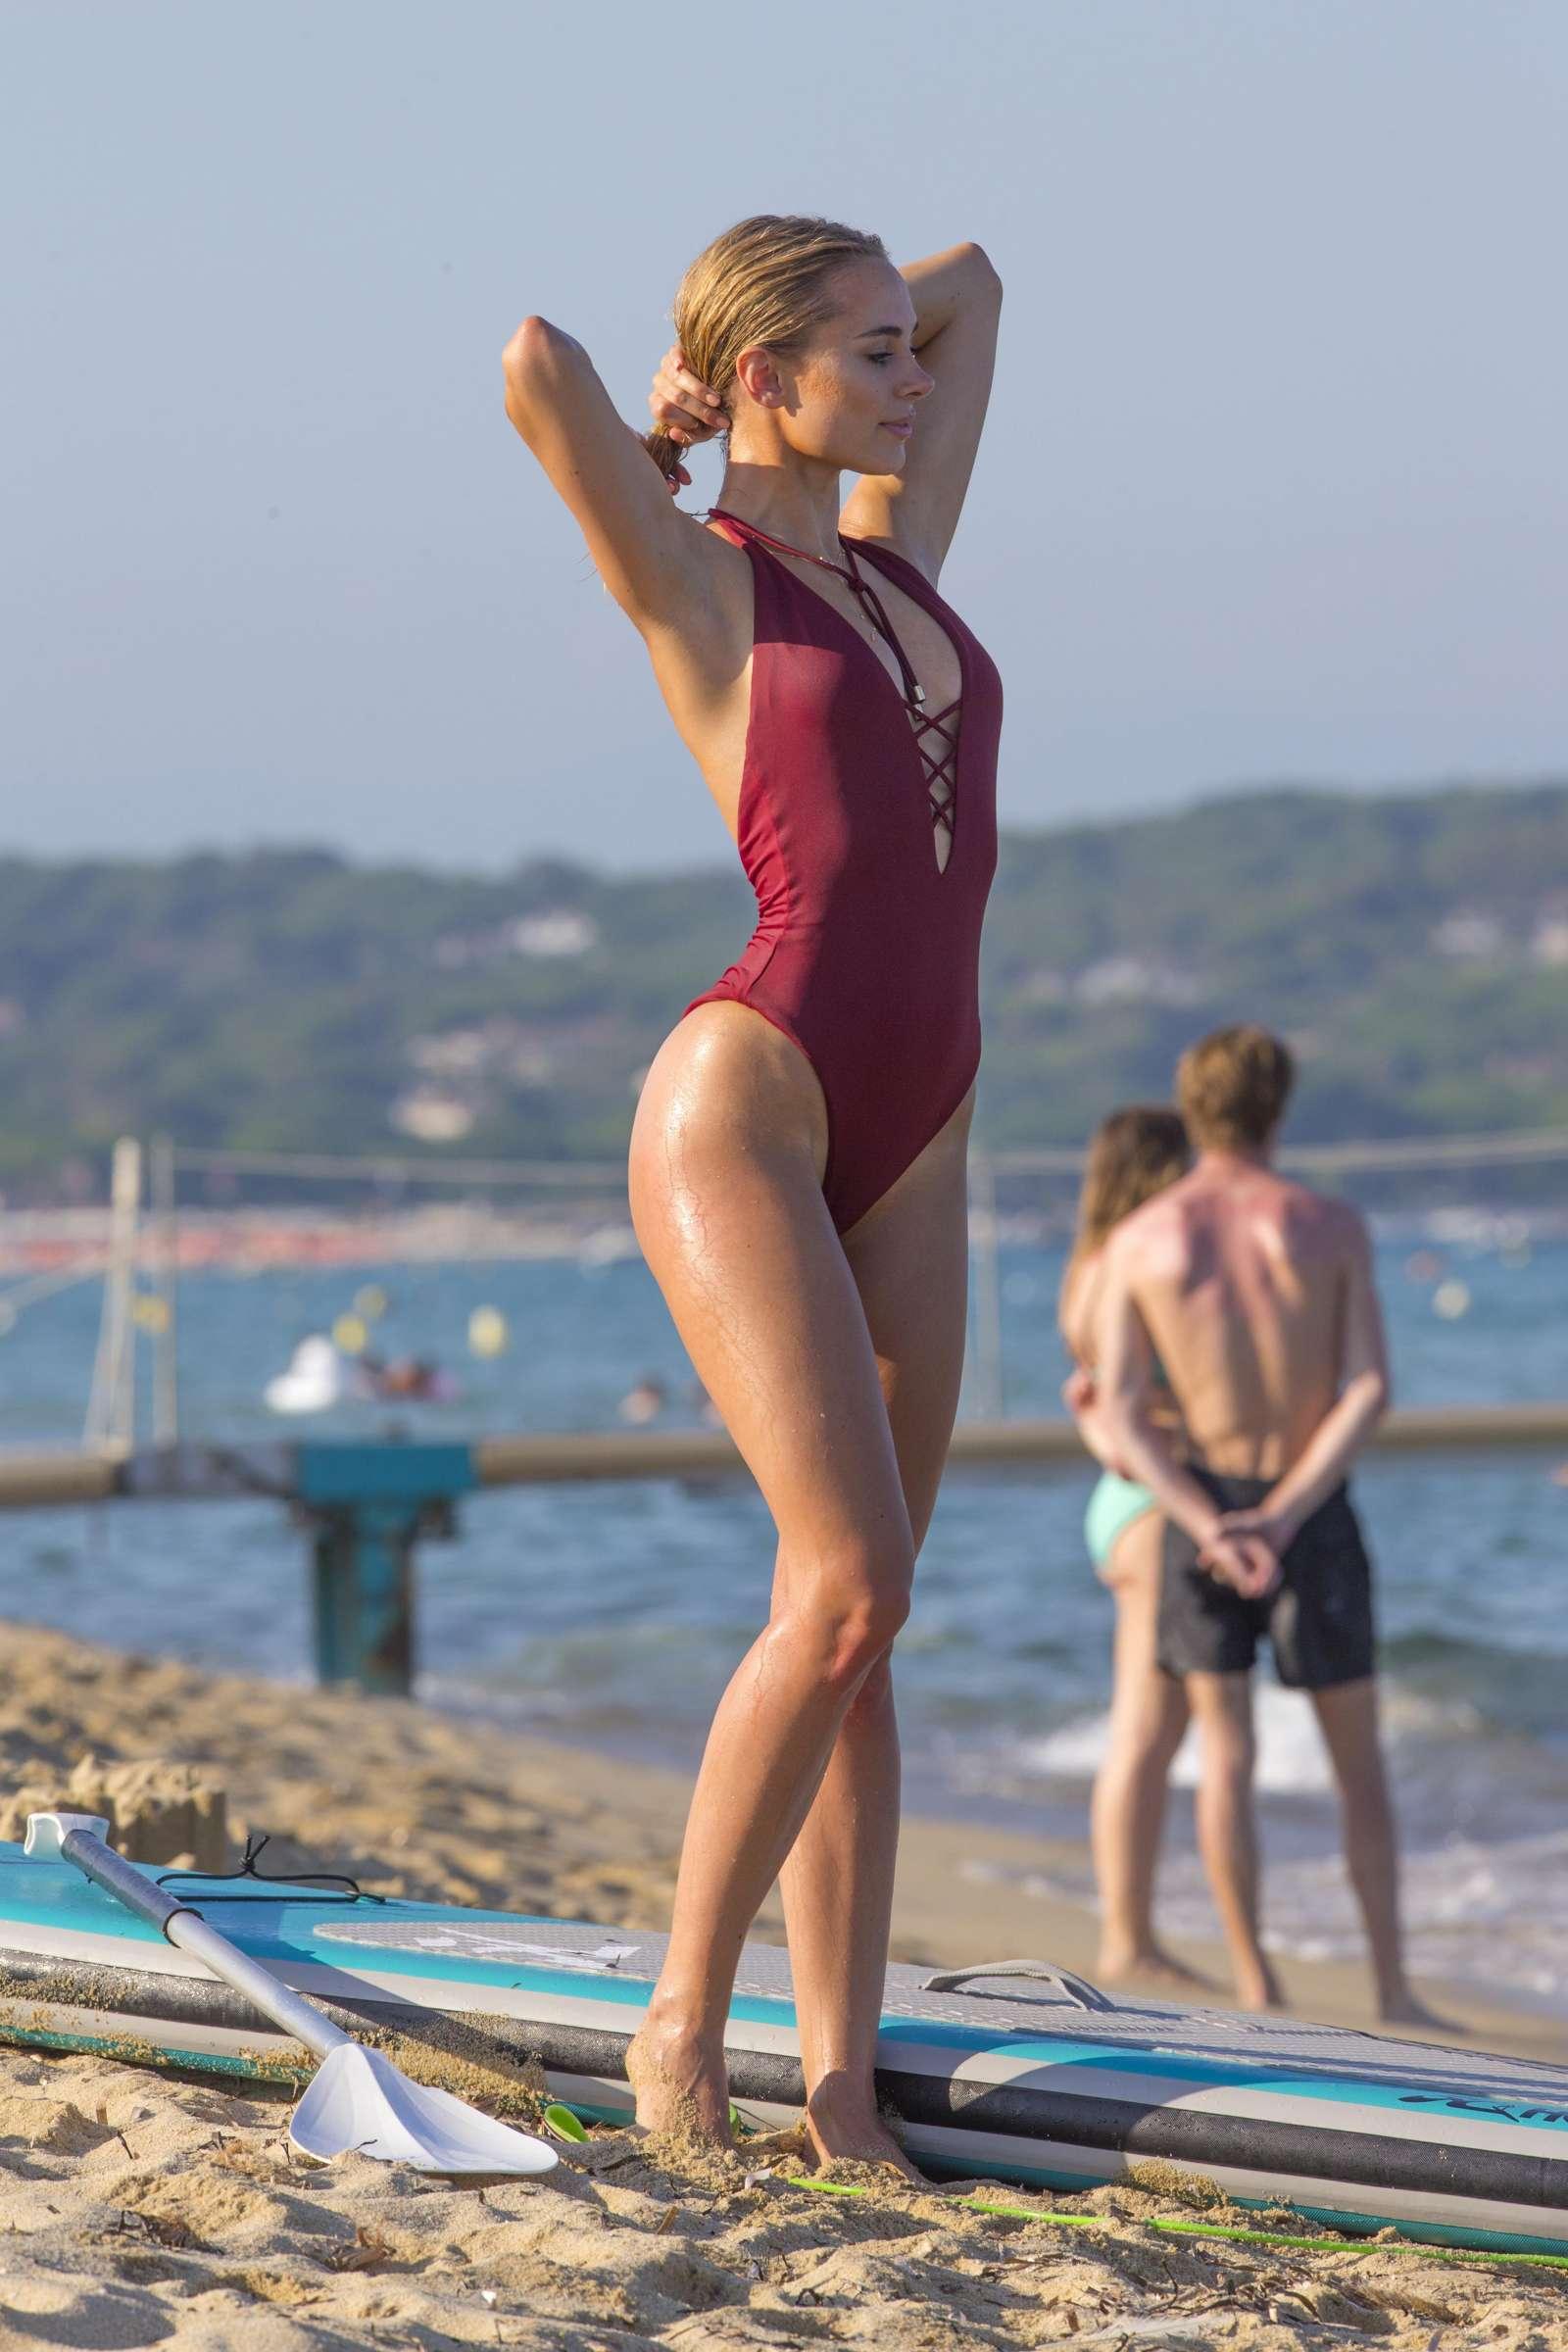 Kimberley Garner Dark Red Swimsuit Paddle Boarding in St Tropez